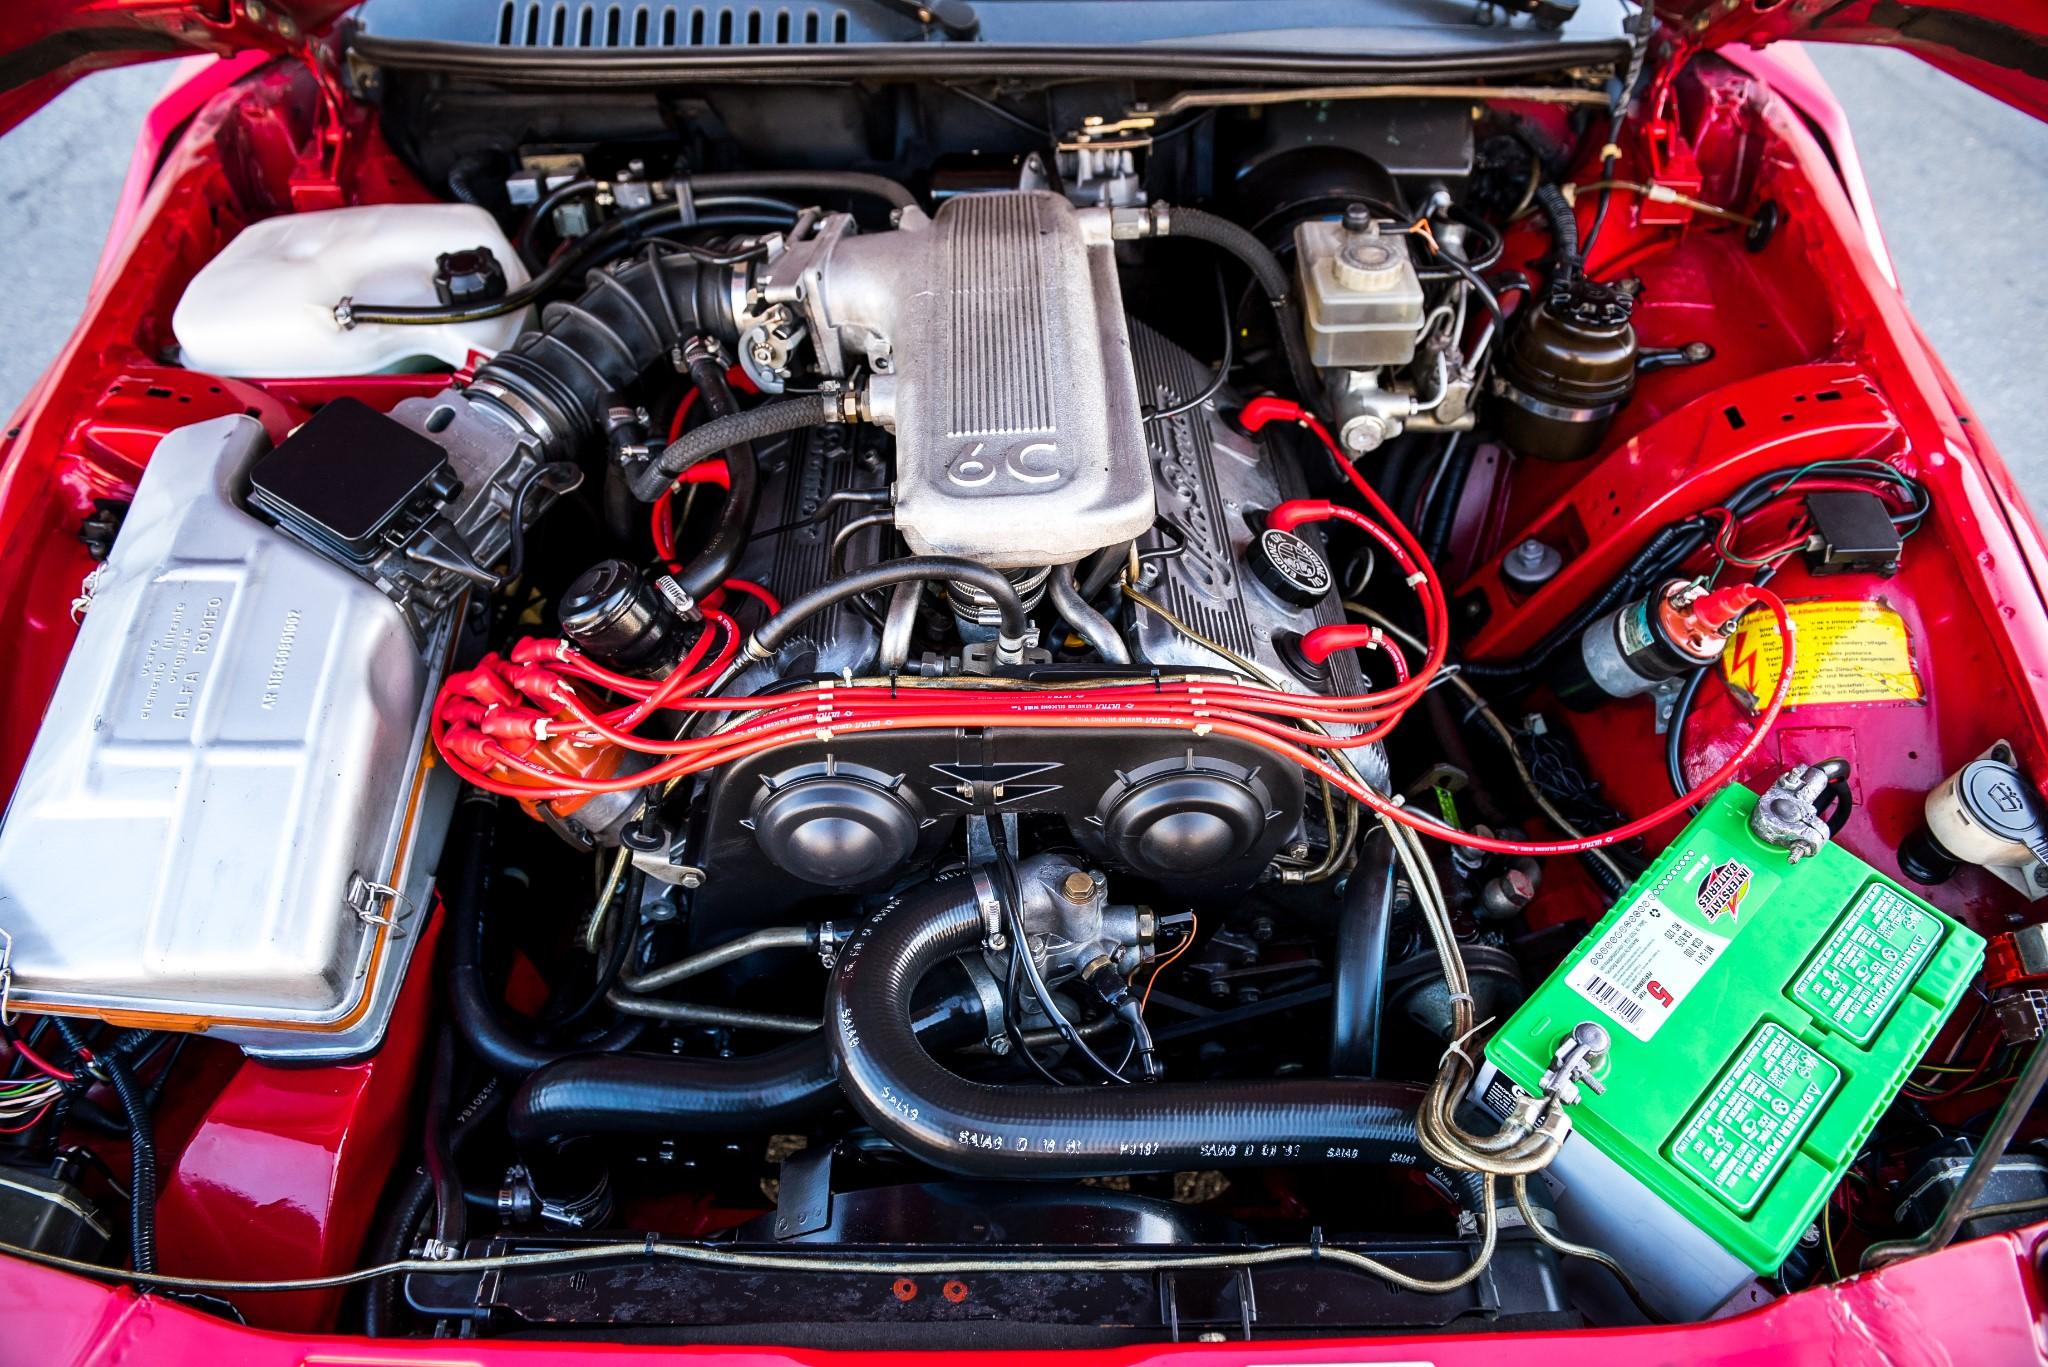 1991 Alfa Romeo SZ engine